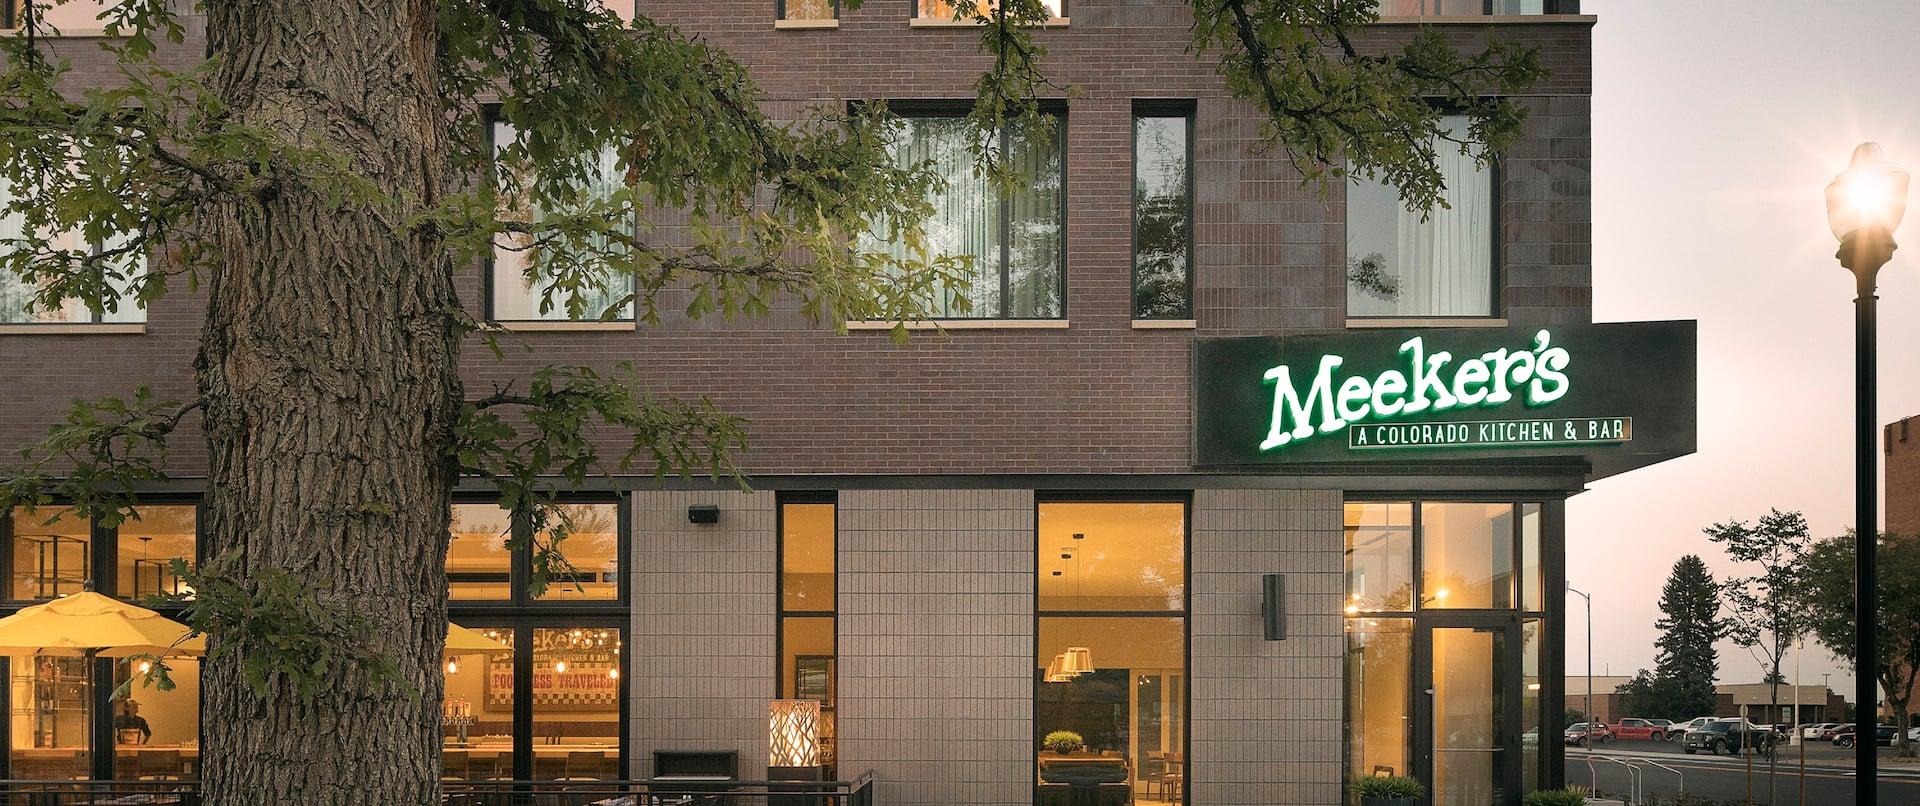 Meeker's Restaurant Outside Entrance